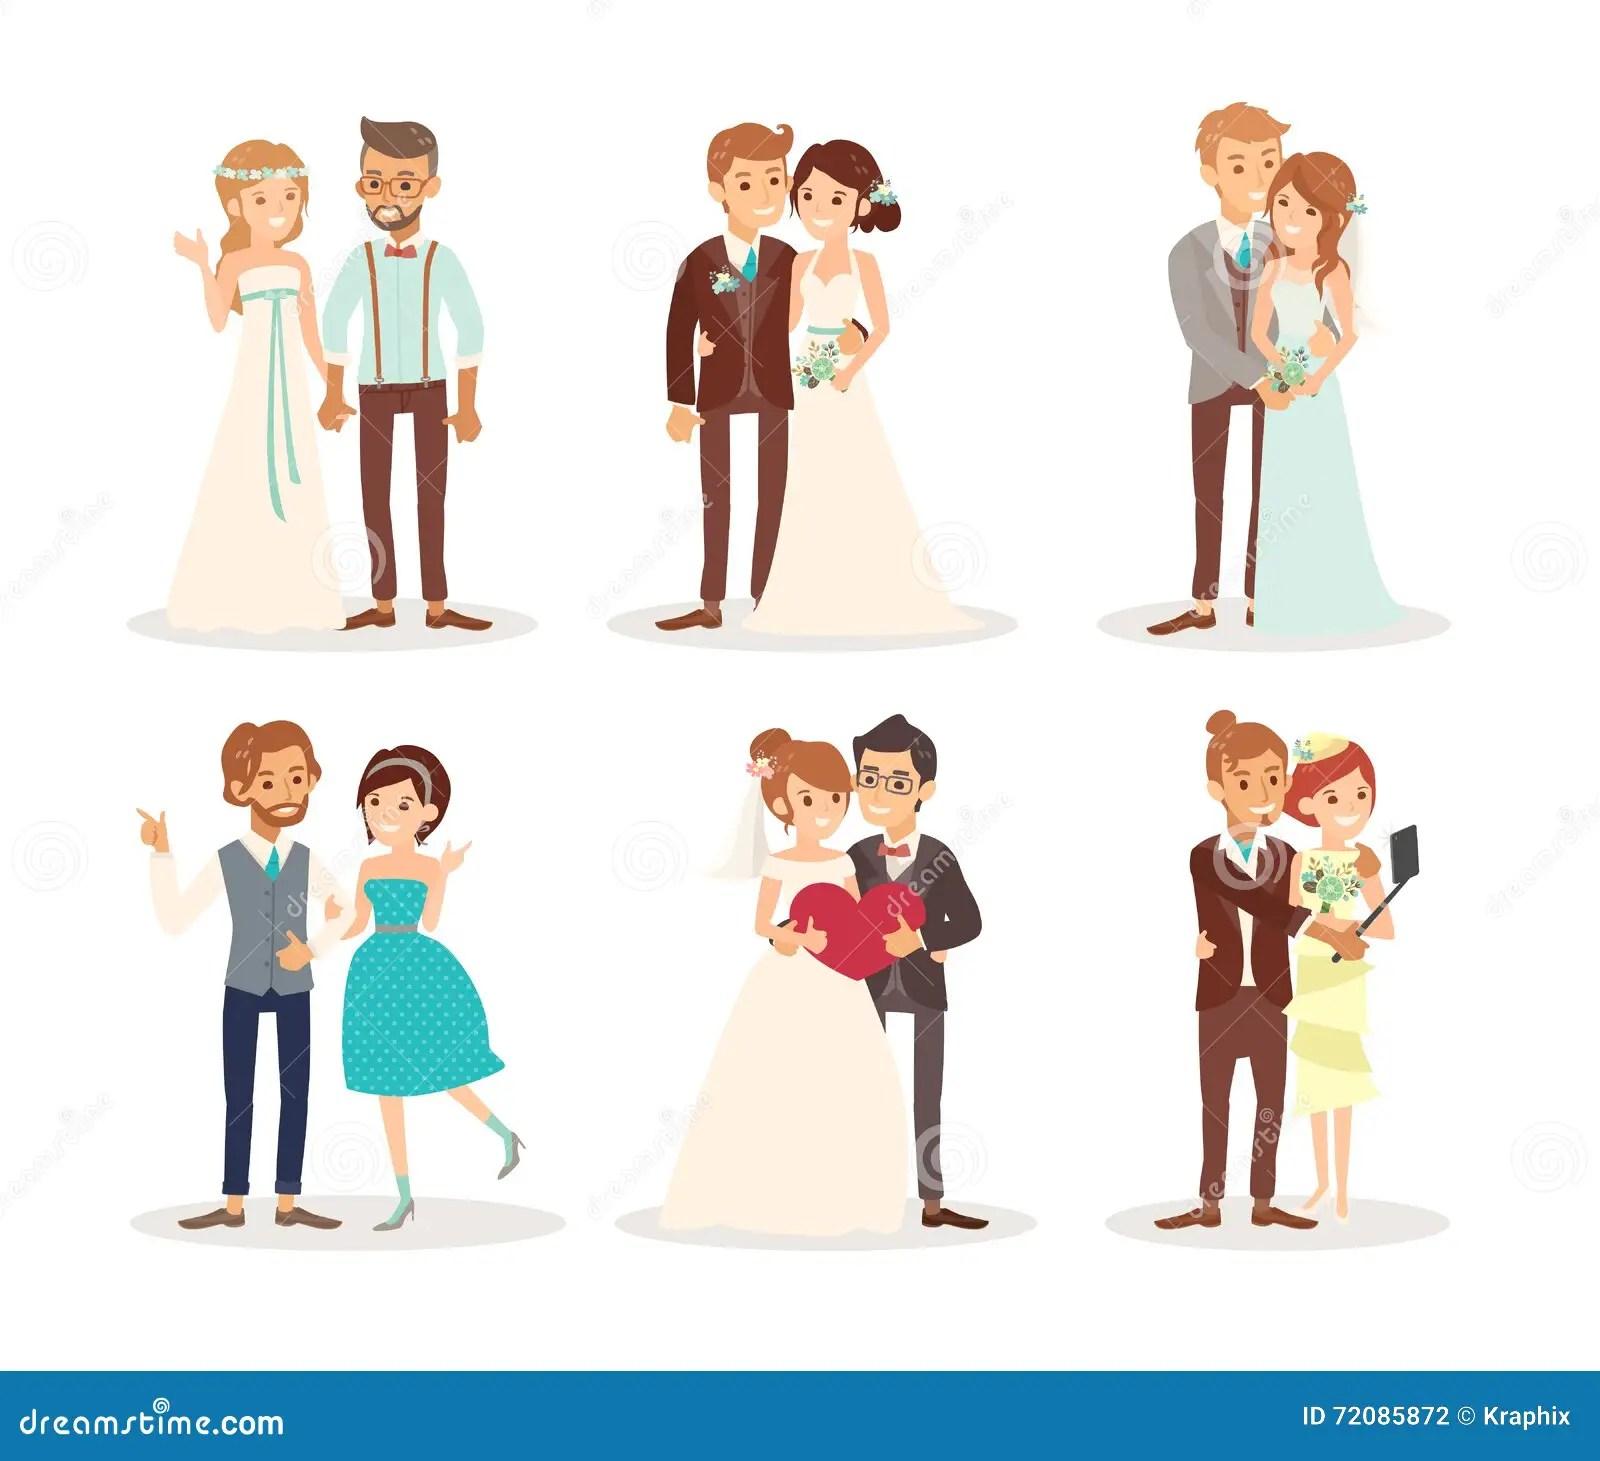 hight resolution of cute wedding couple bride and groom cartoon